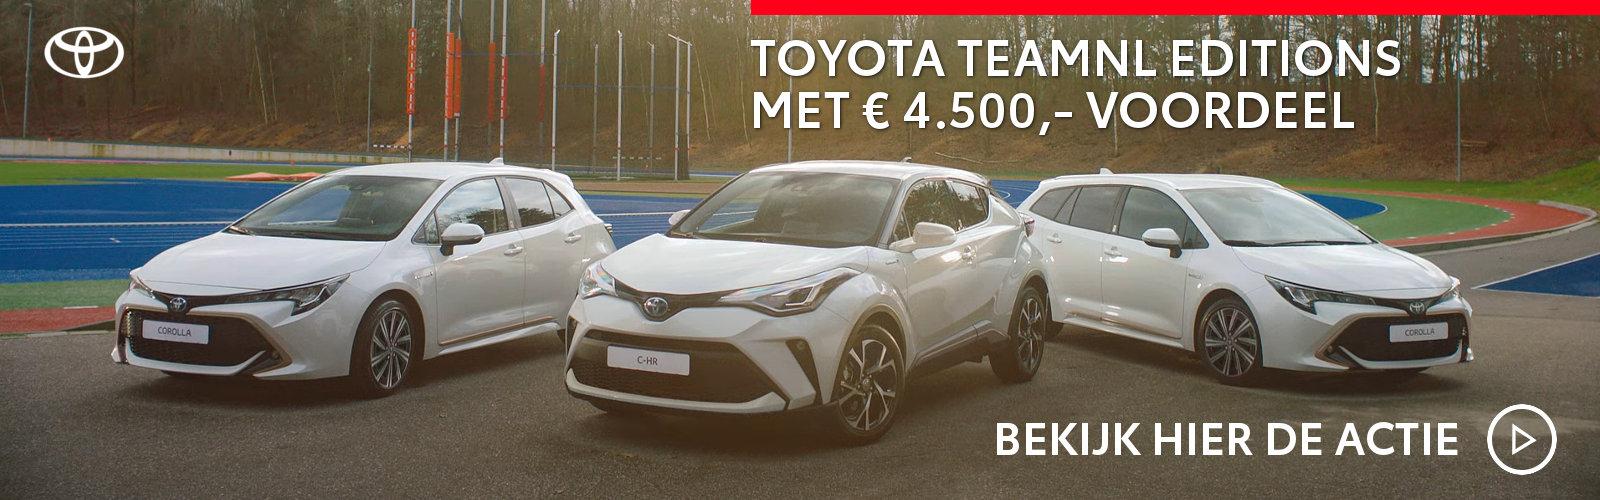 mengelers-automotive-toyota-teamnl-editions